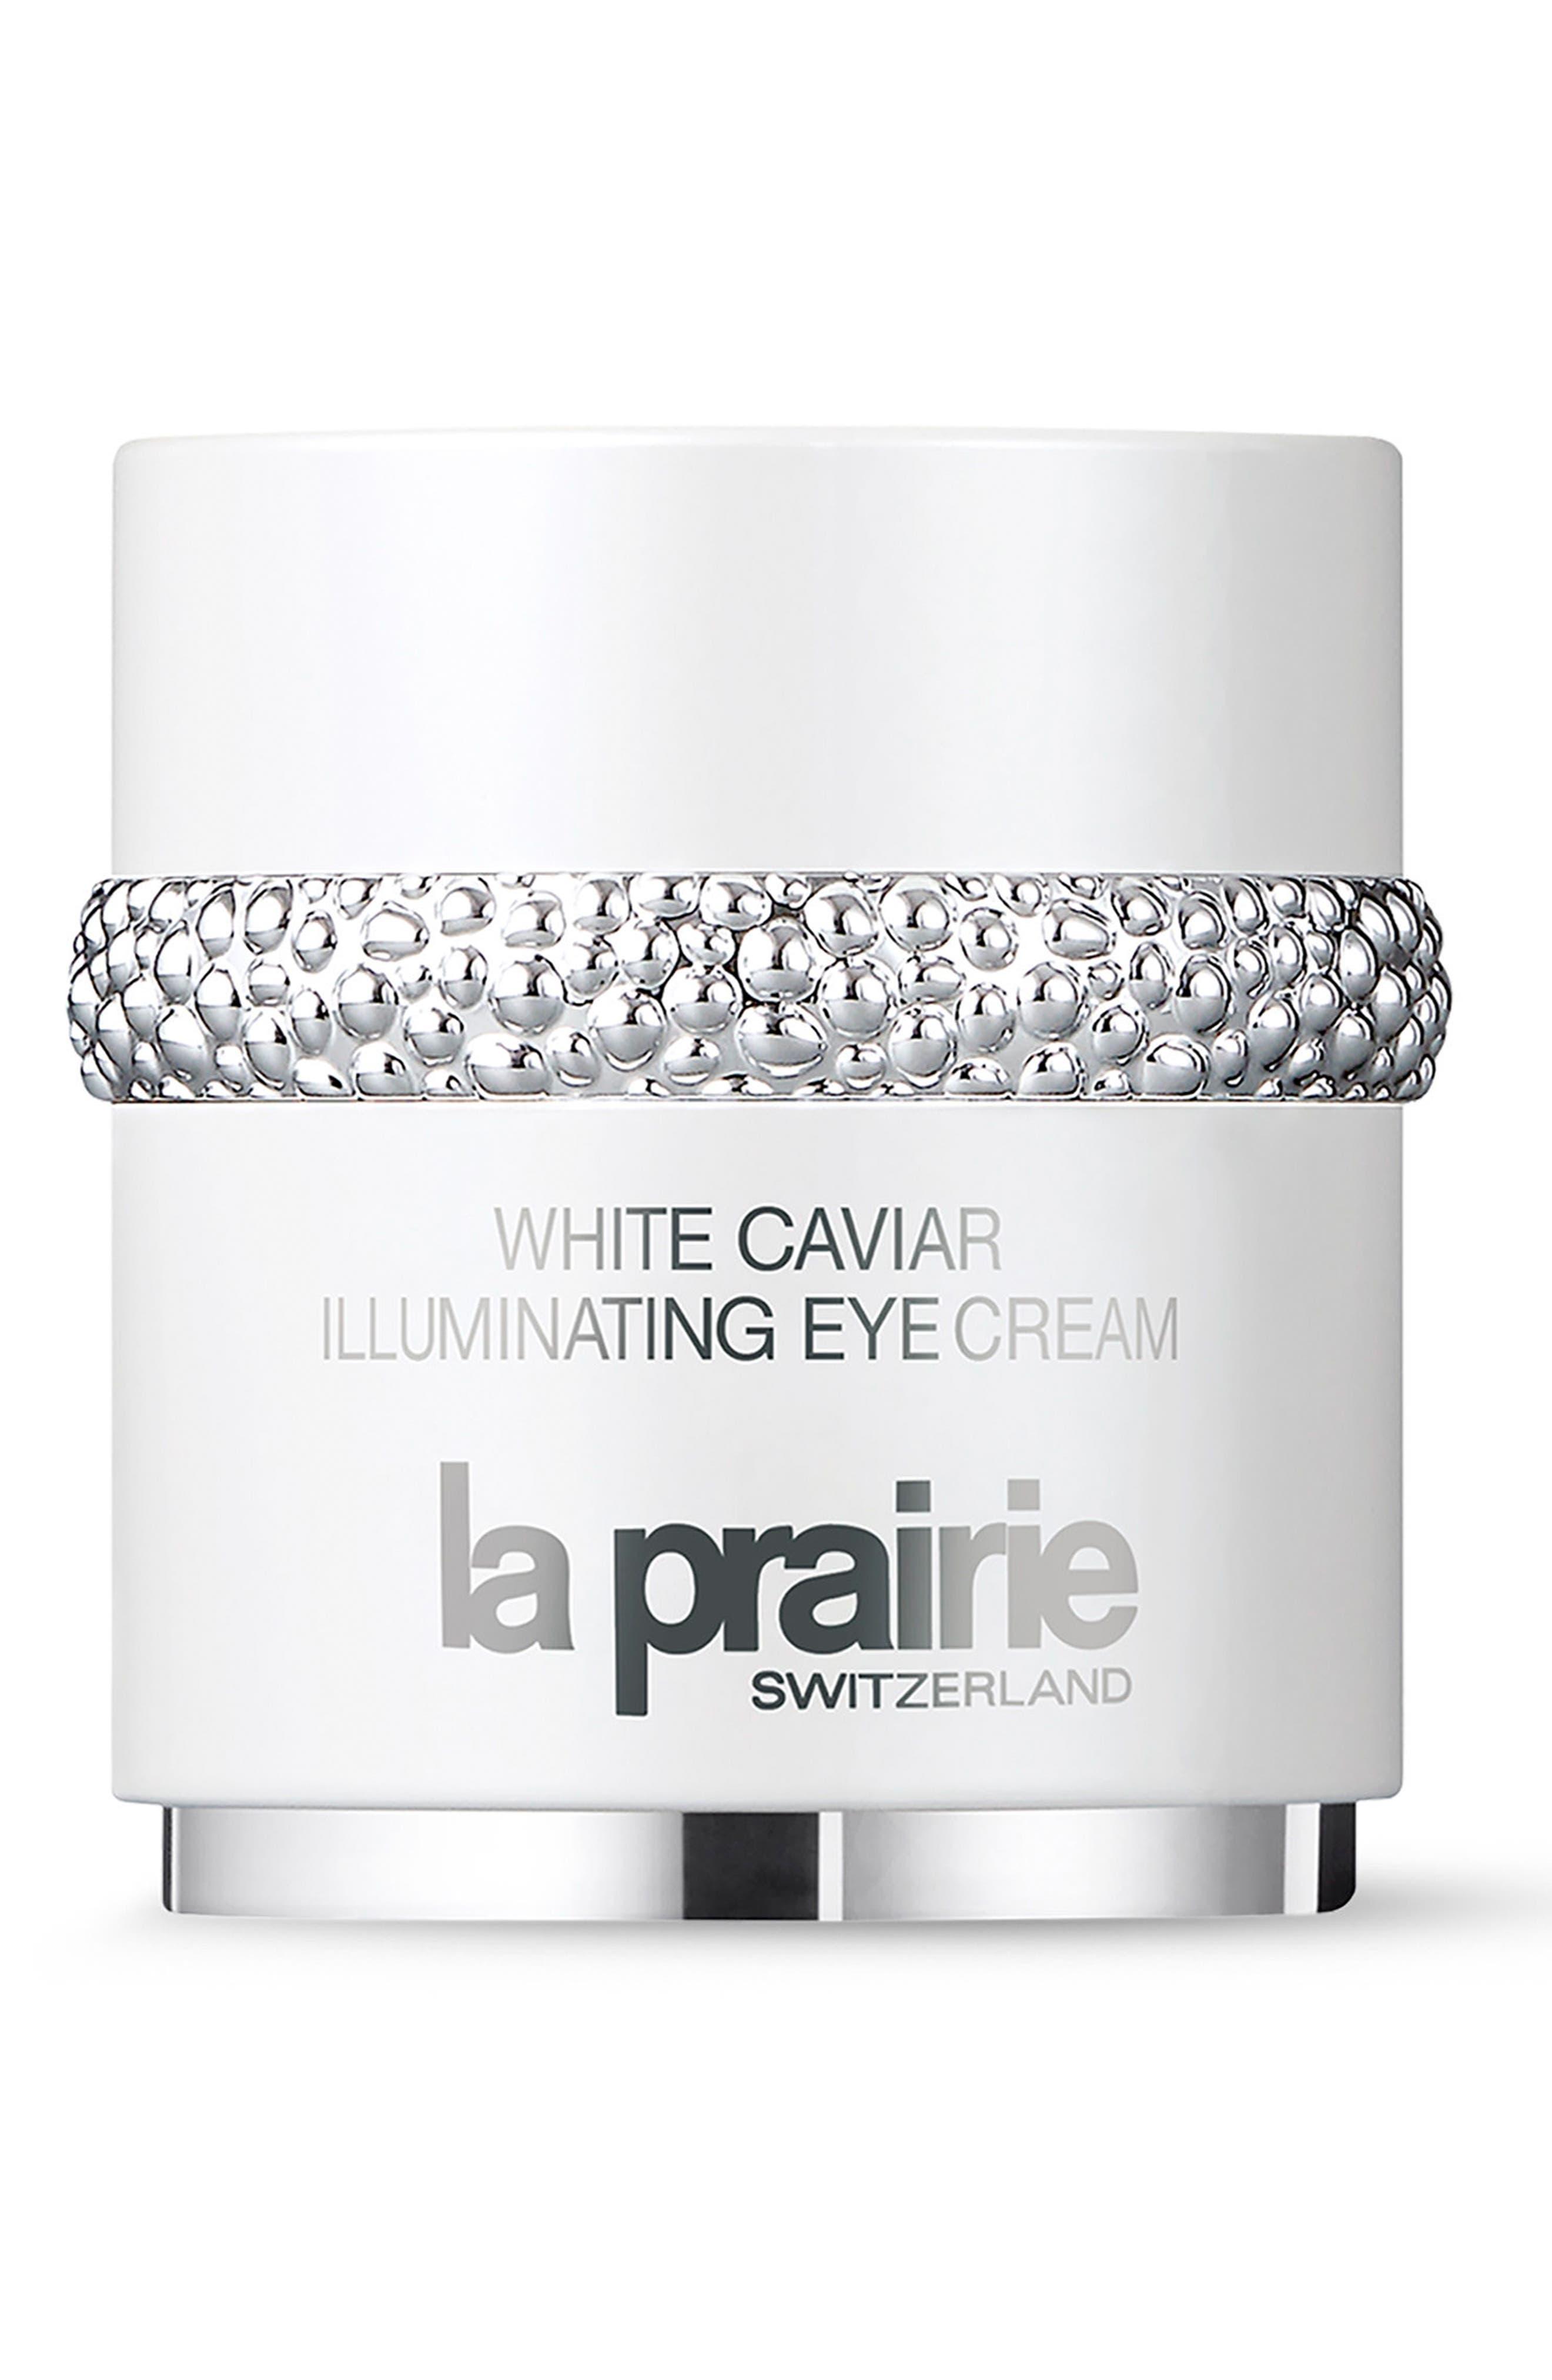 White Caviar Illuminating Eye Cream,                         Main,                         color, NO COLOR